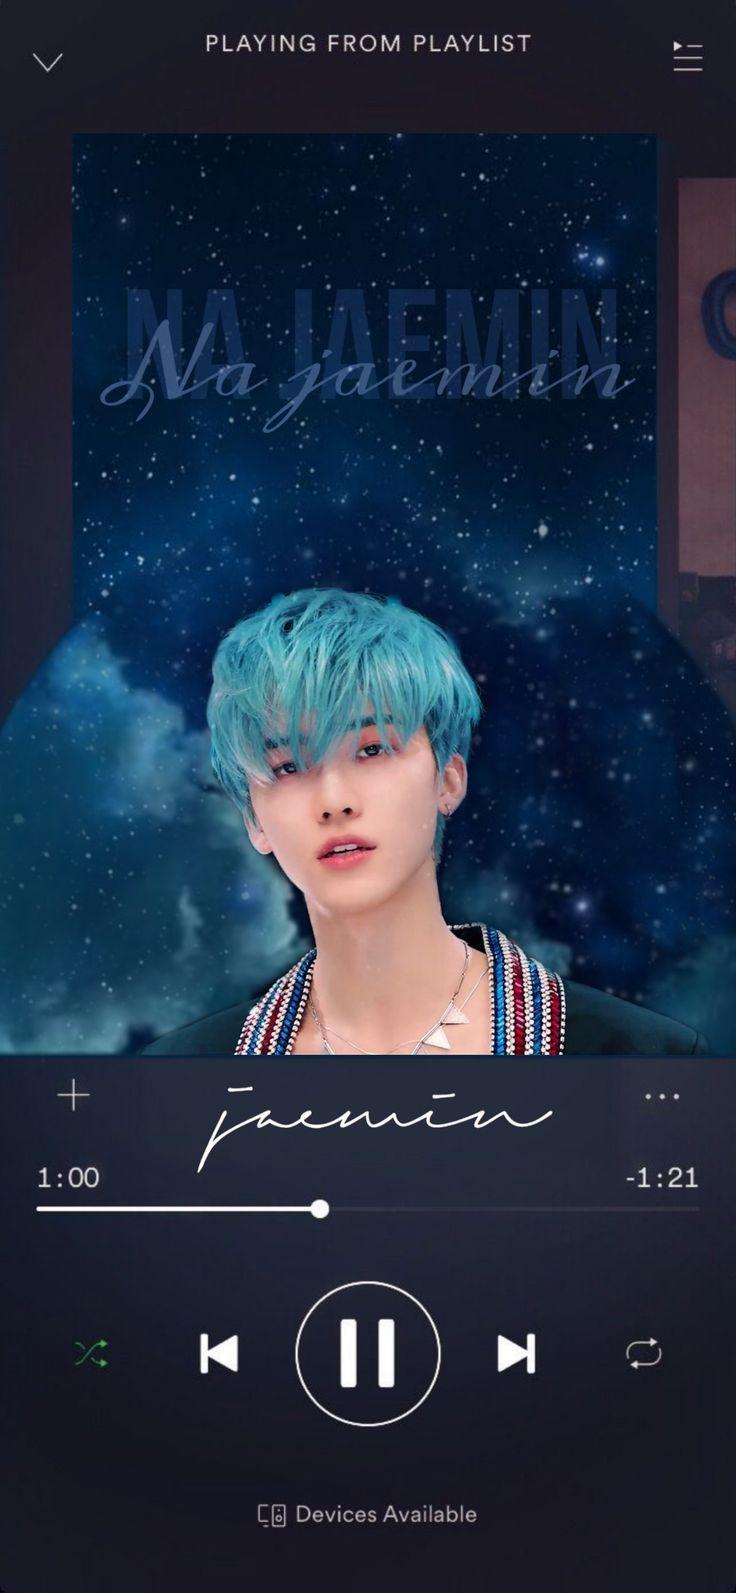 Jaemin wallpaper in 2020 Kpop wallpaper Wallpaper Poster